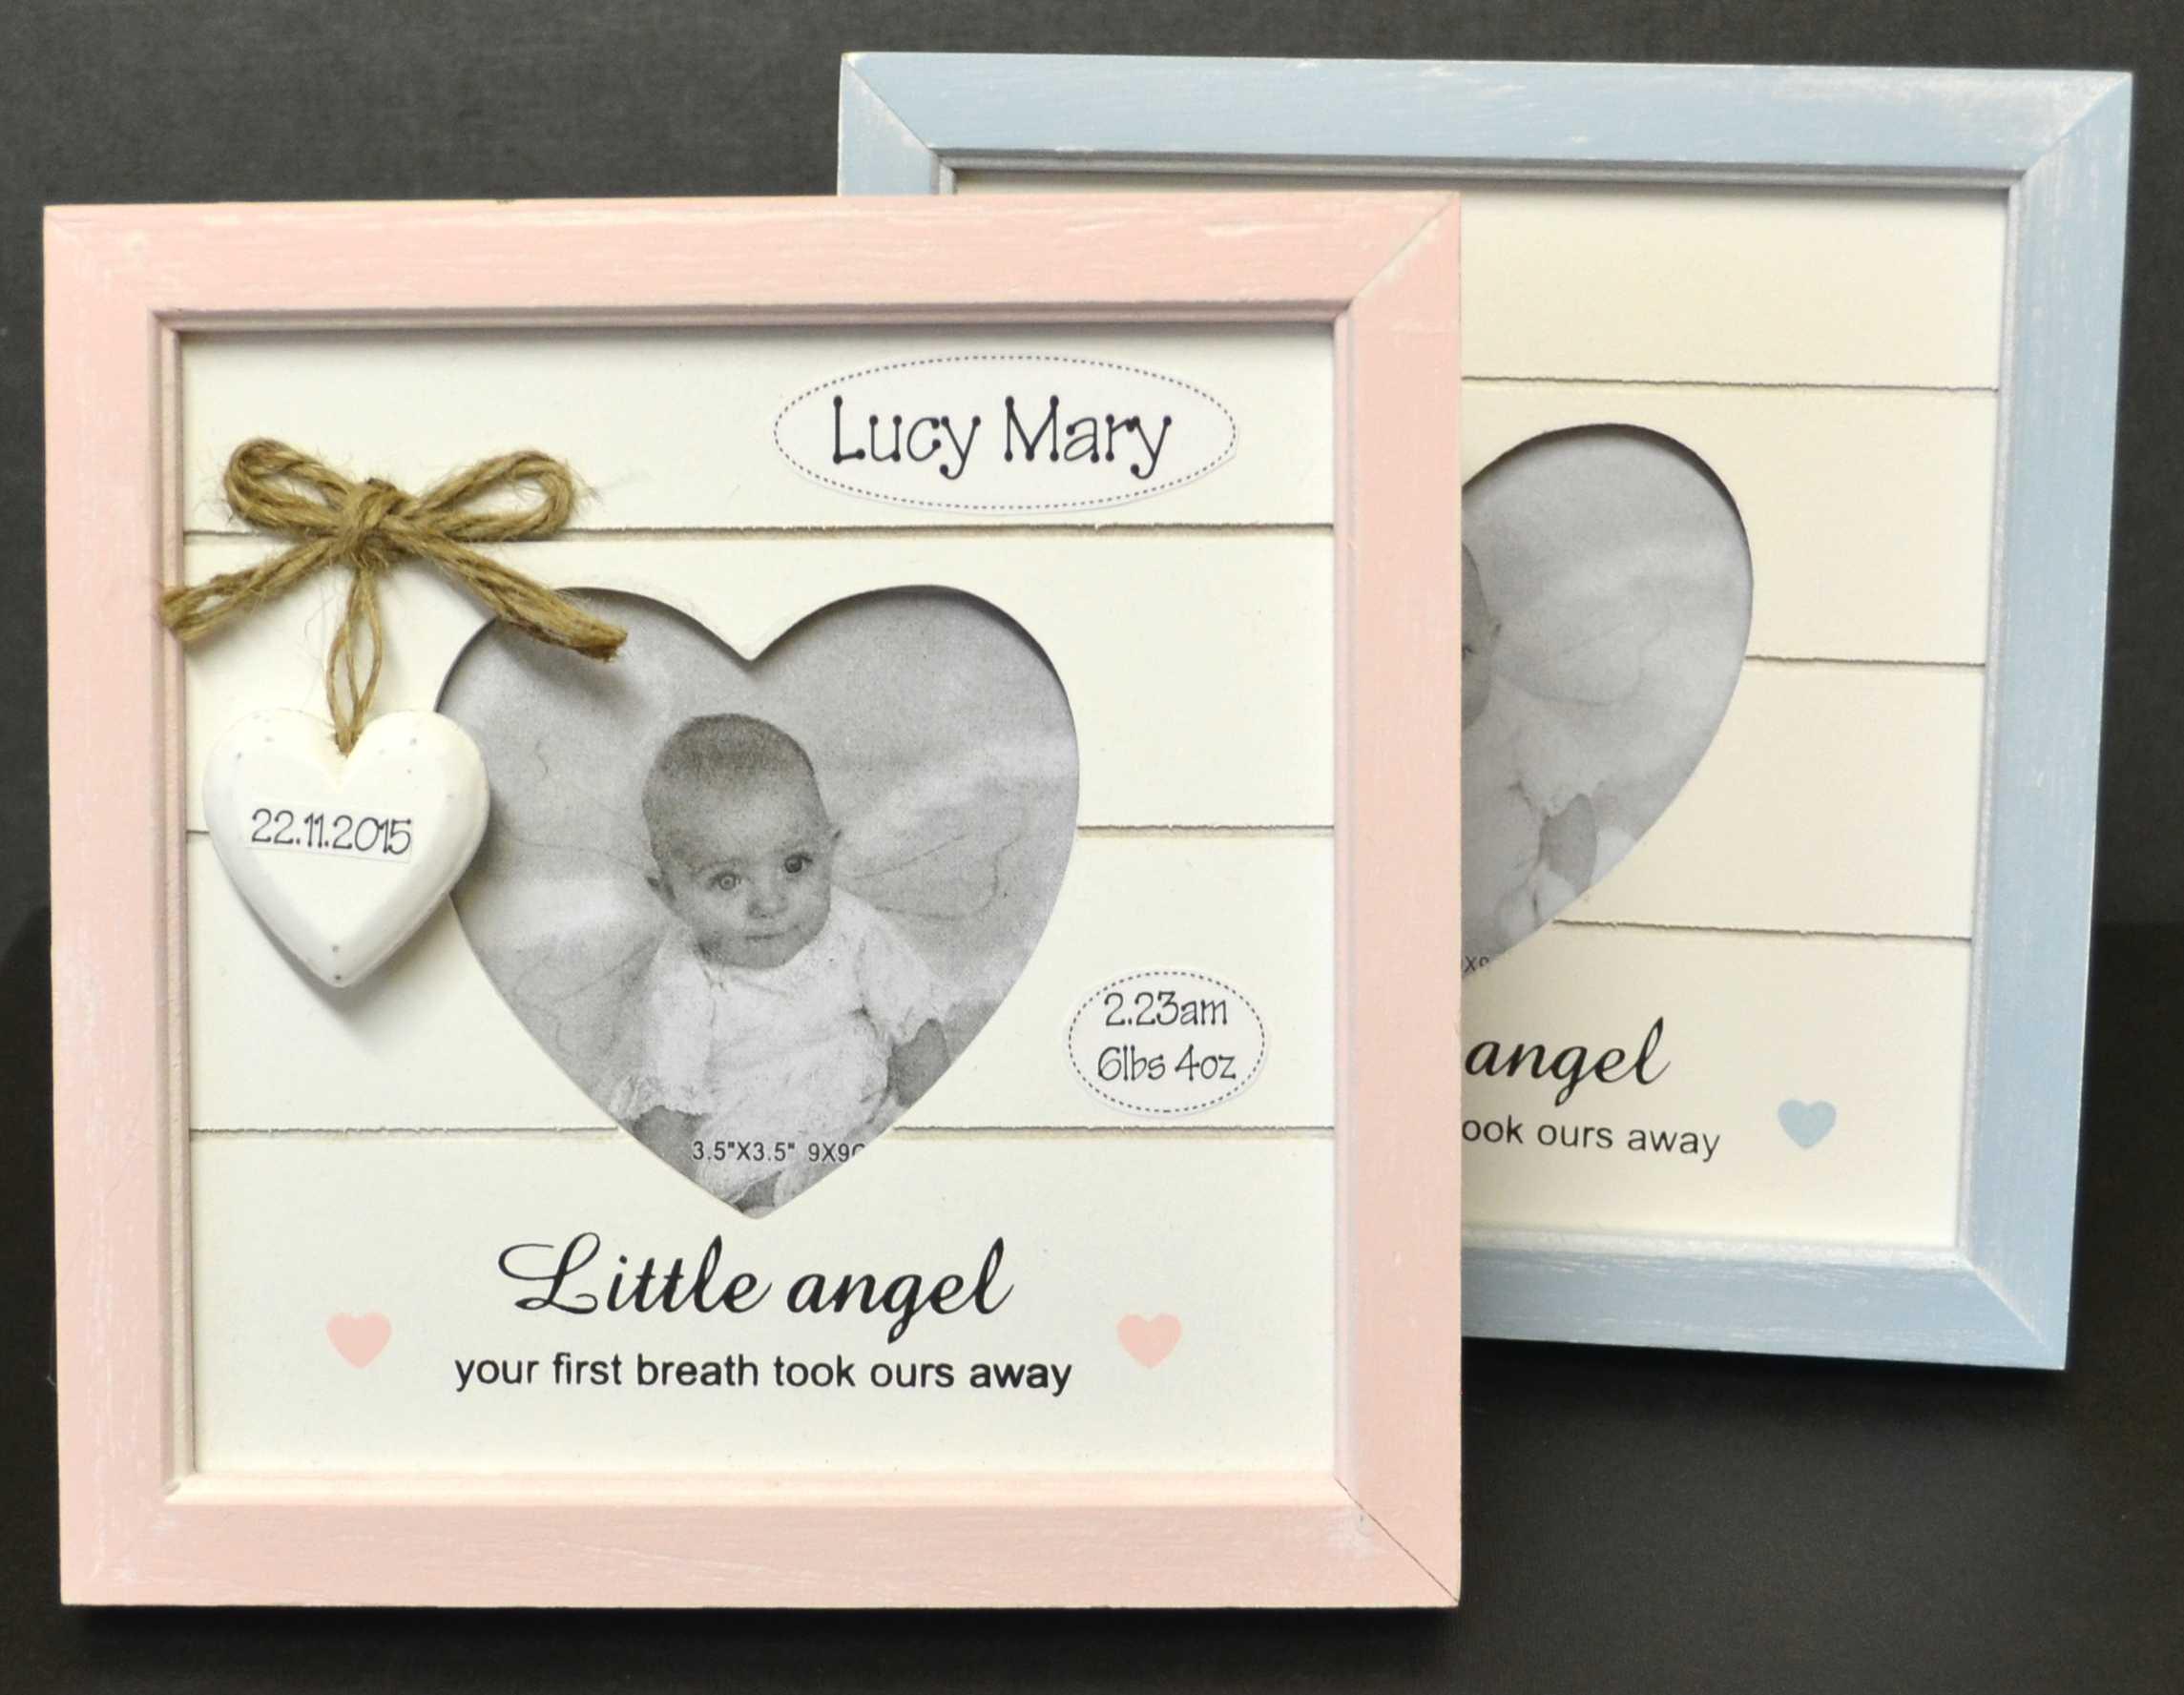 Personalised Wedding Gift Ideas Ireland - Wedding Invitation Sample